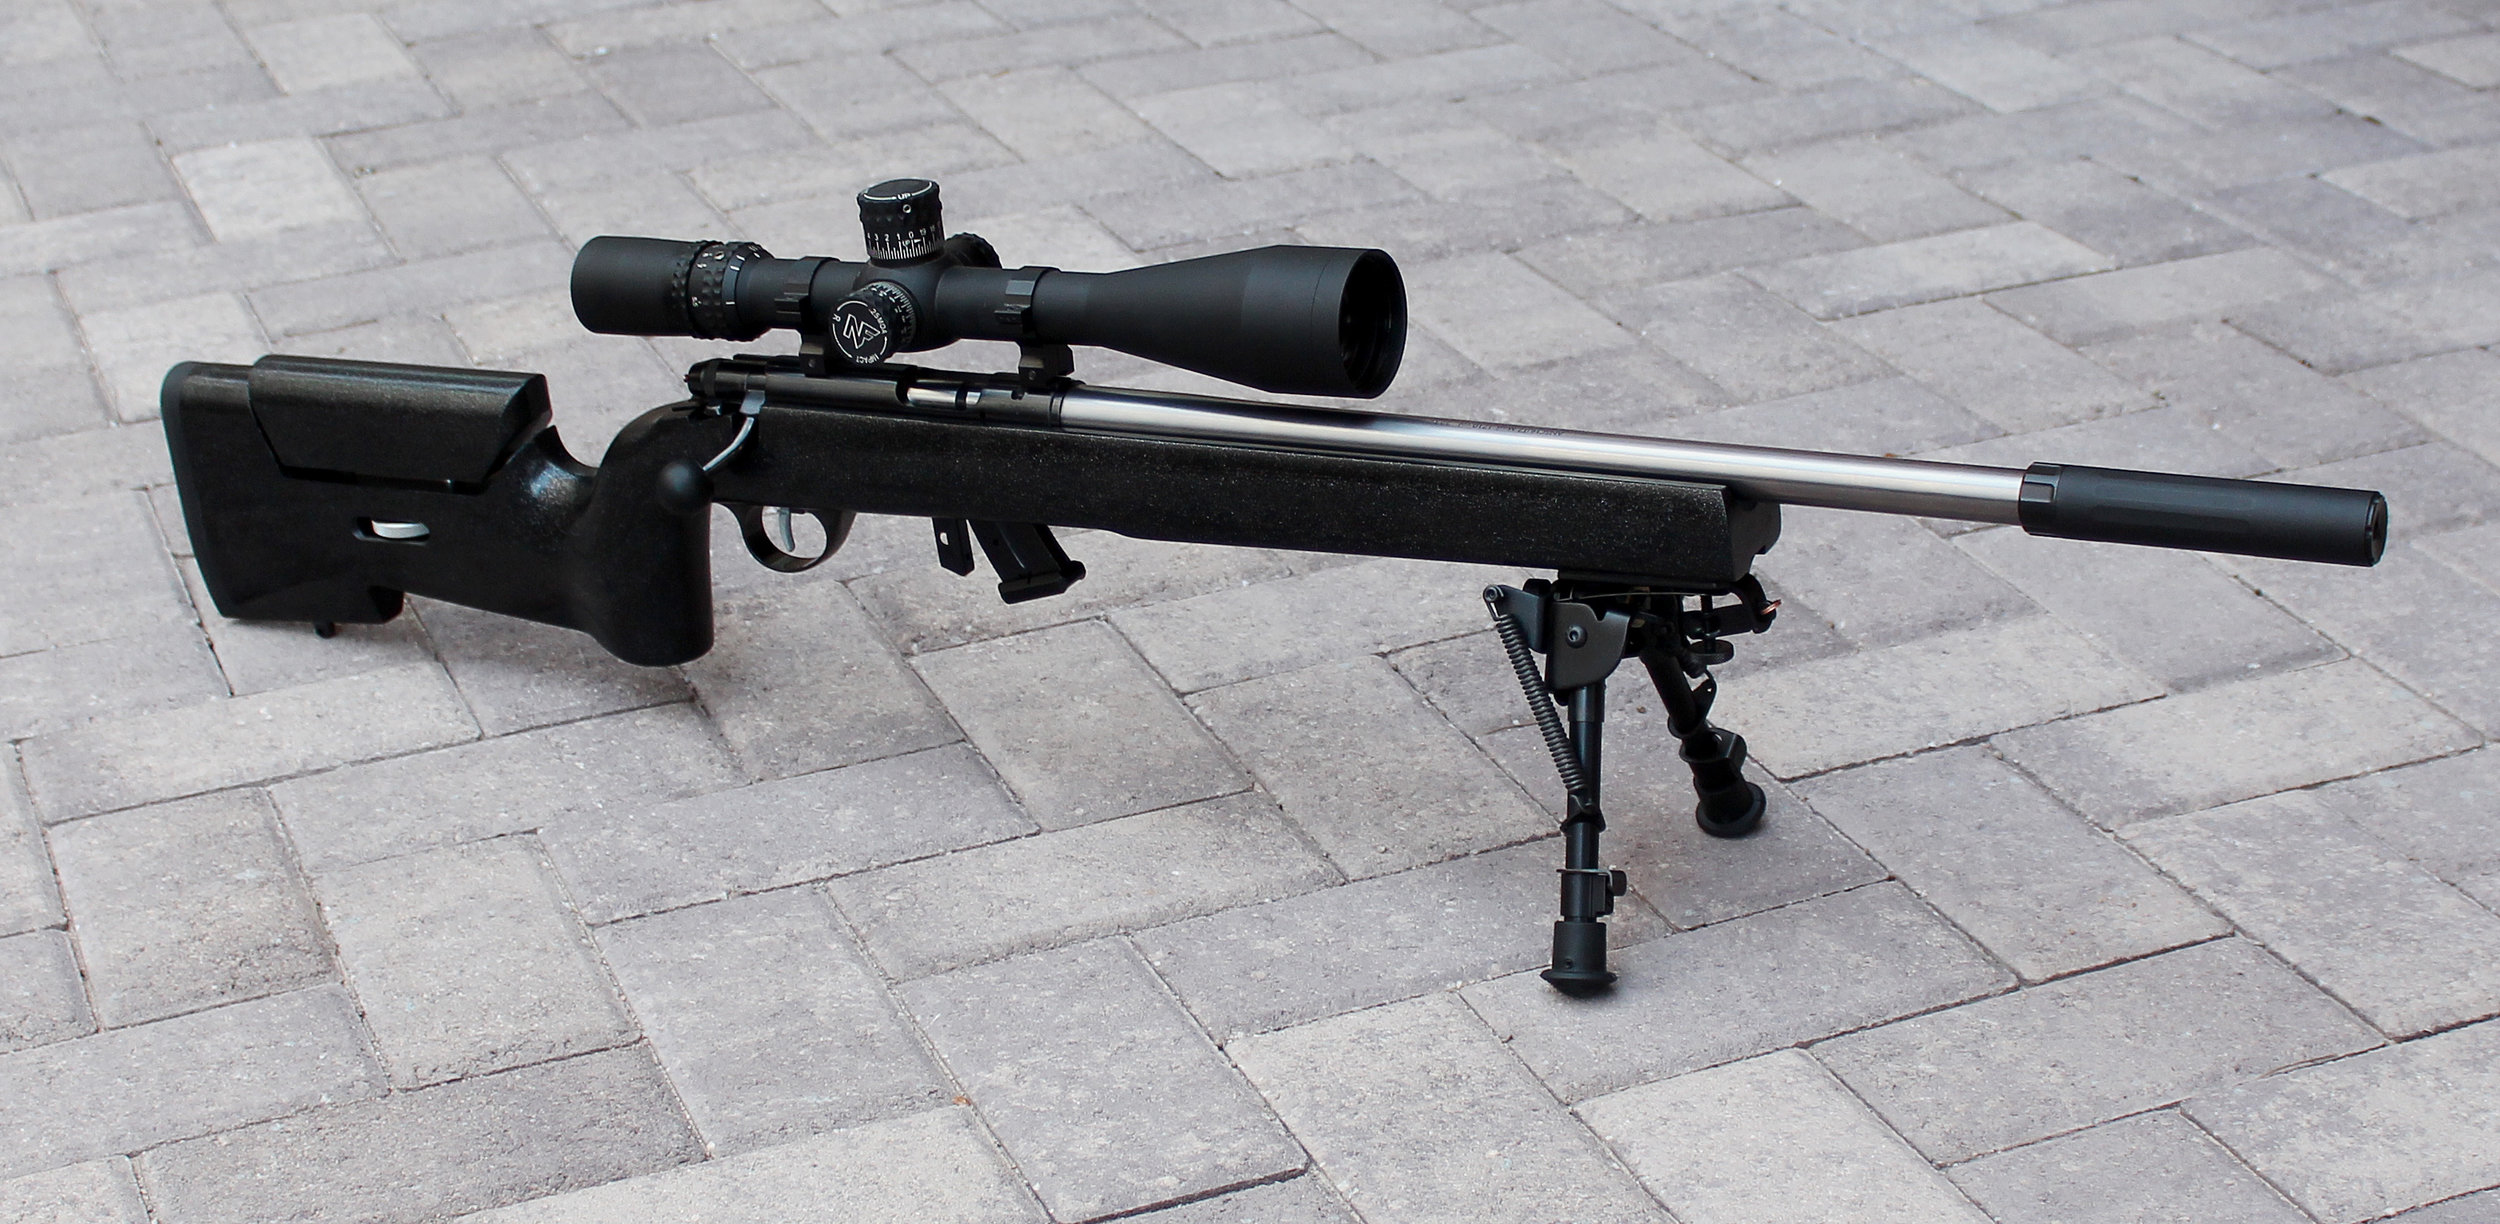 Anschutz 1710 Precision Trainer Rifles — SPECIAL PURPOSE RIFLES